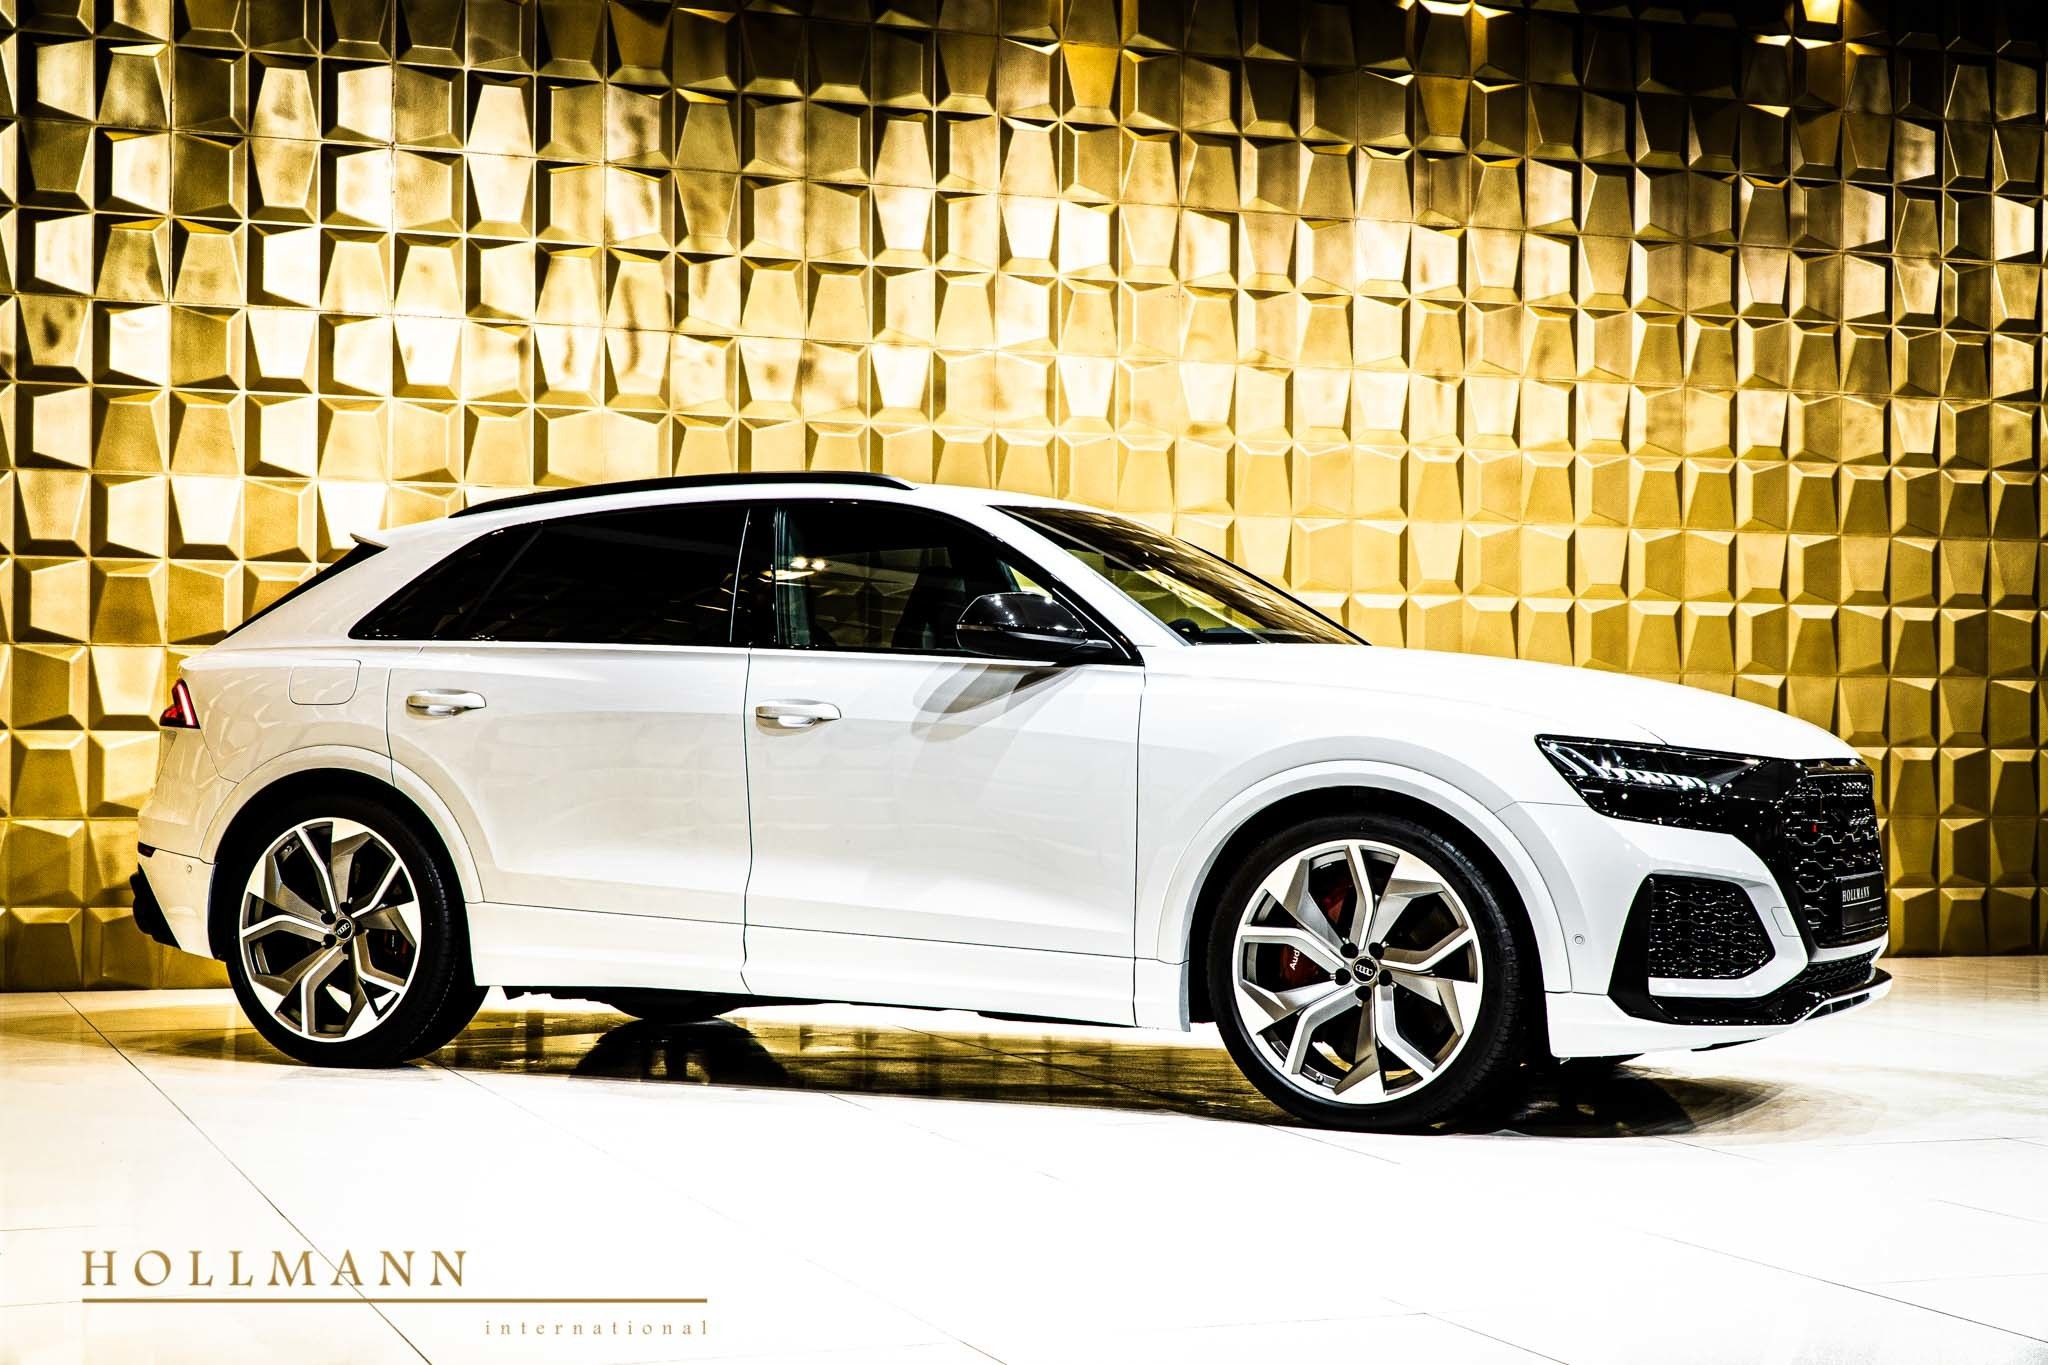 Audi Rs Q8 Hollmann International Germany For Sale On Luxurypulse En 2020 Voiture